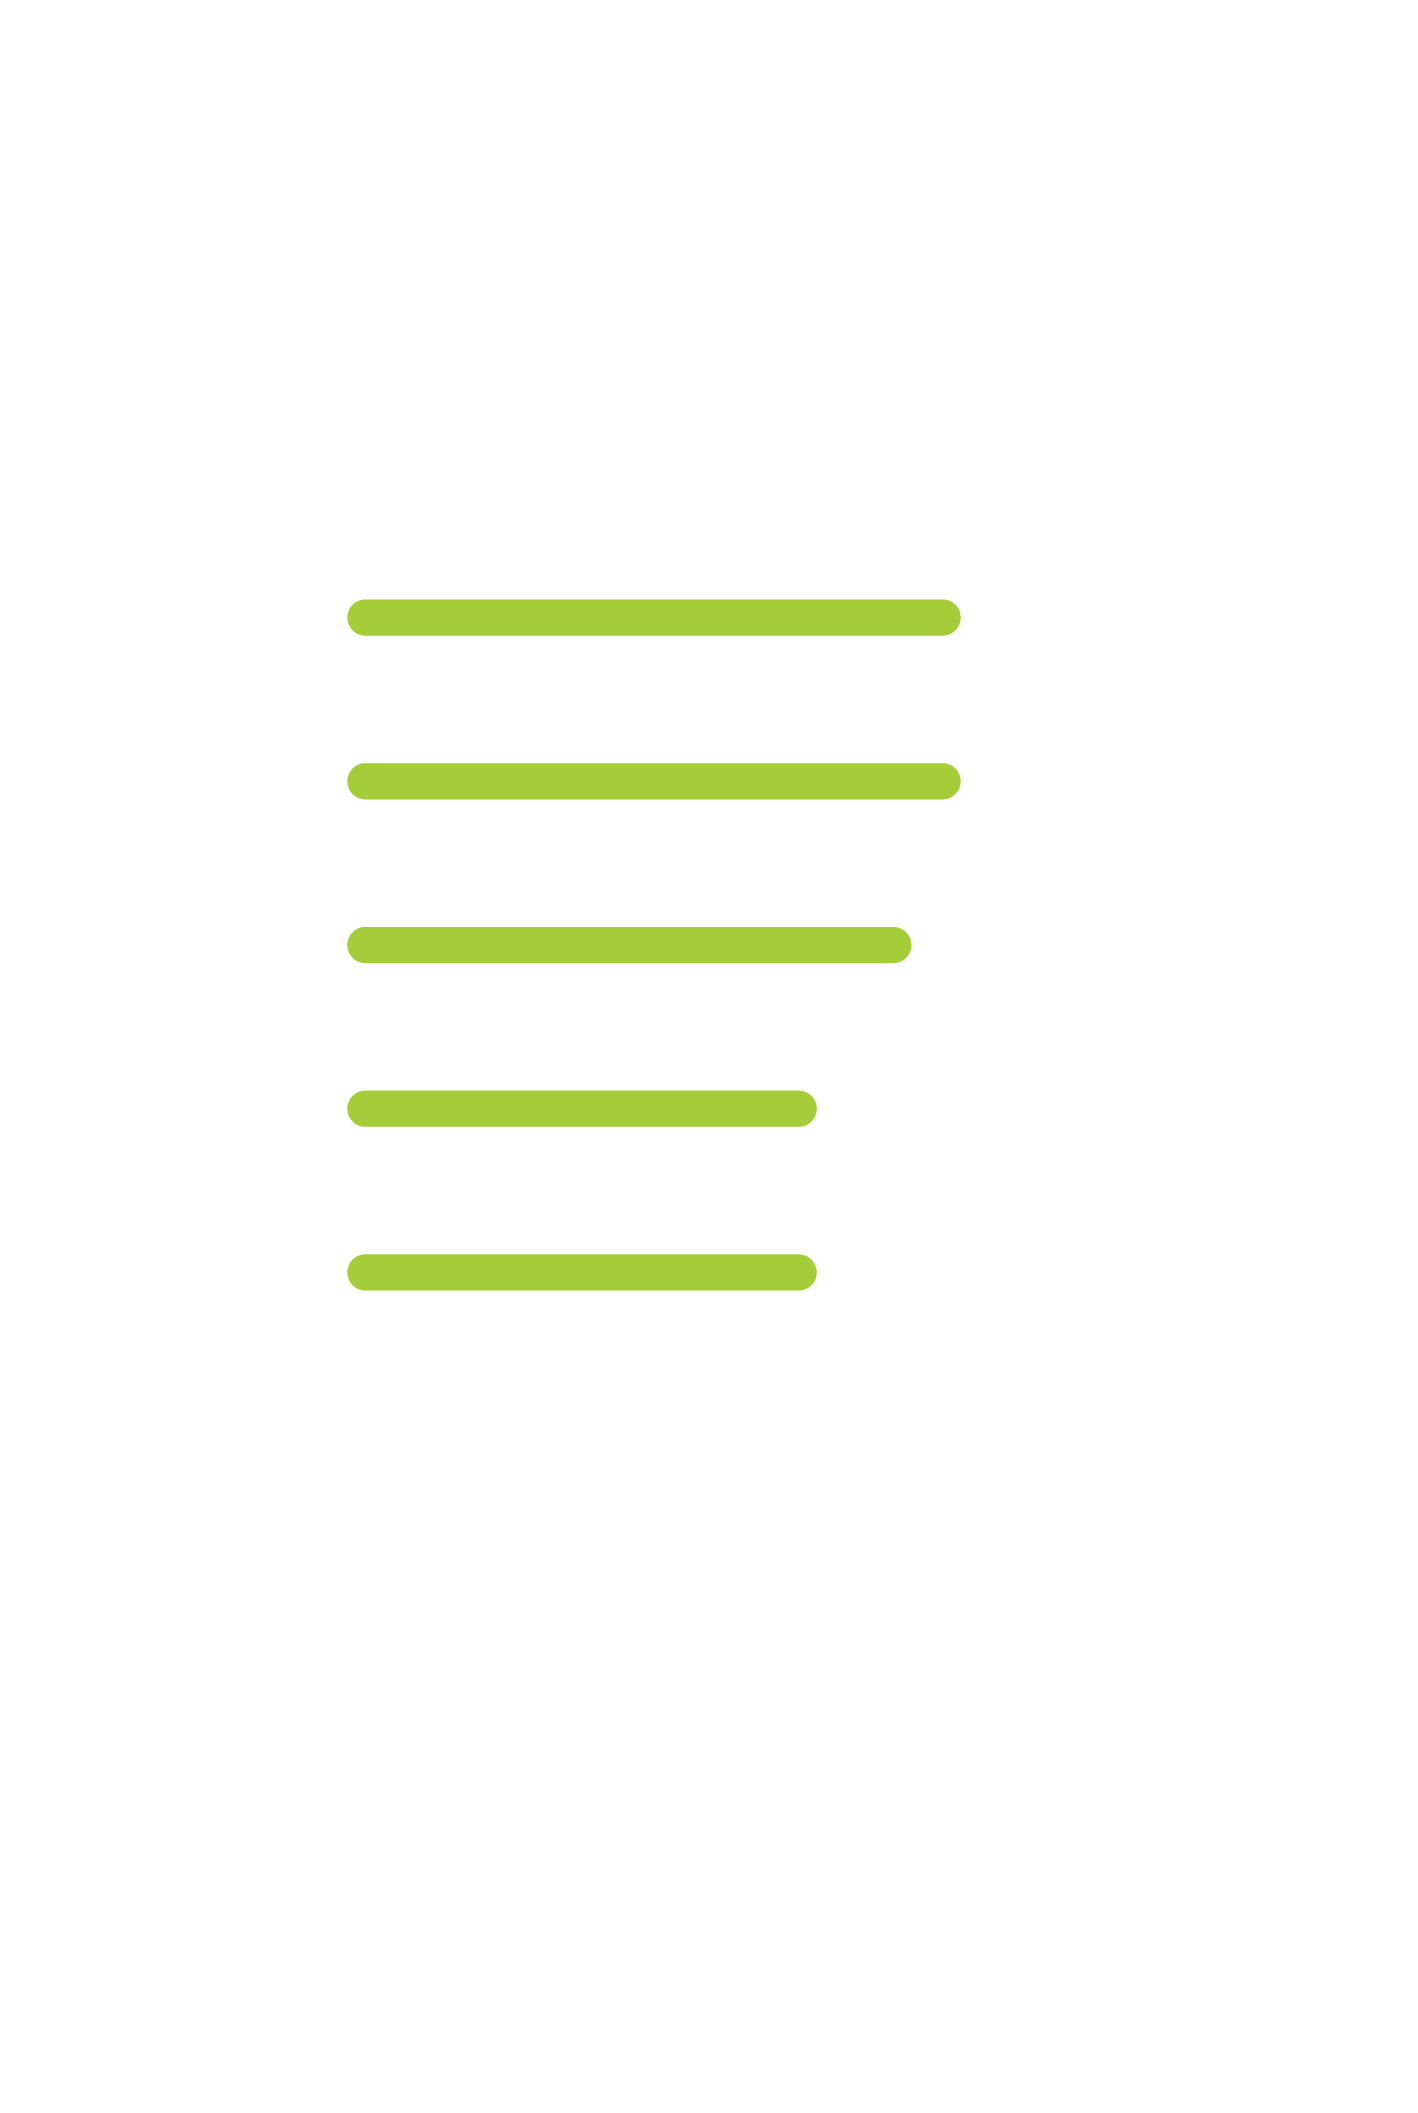 Conceptualization & Script Writing